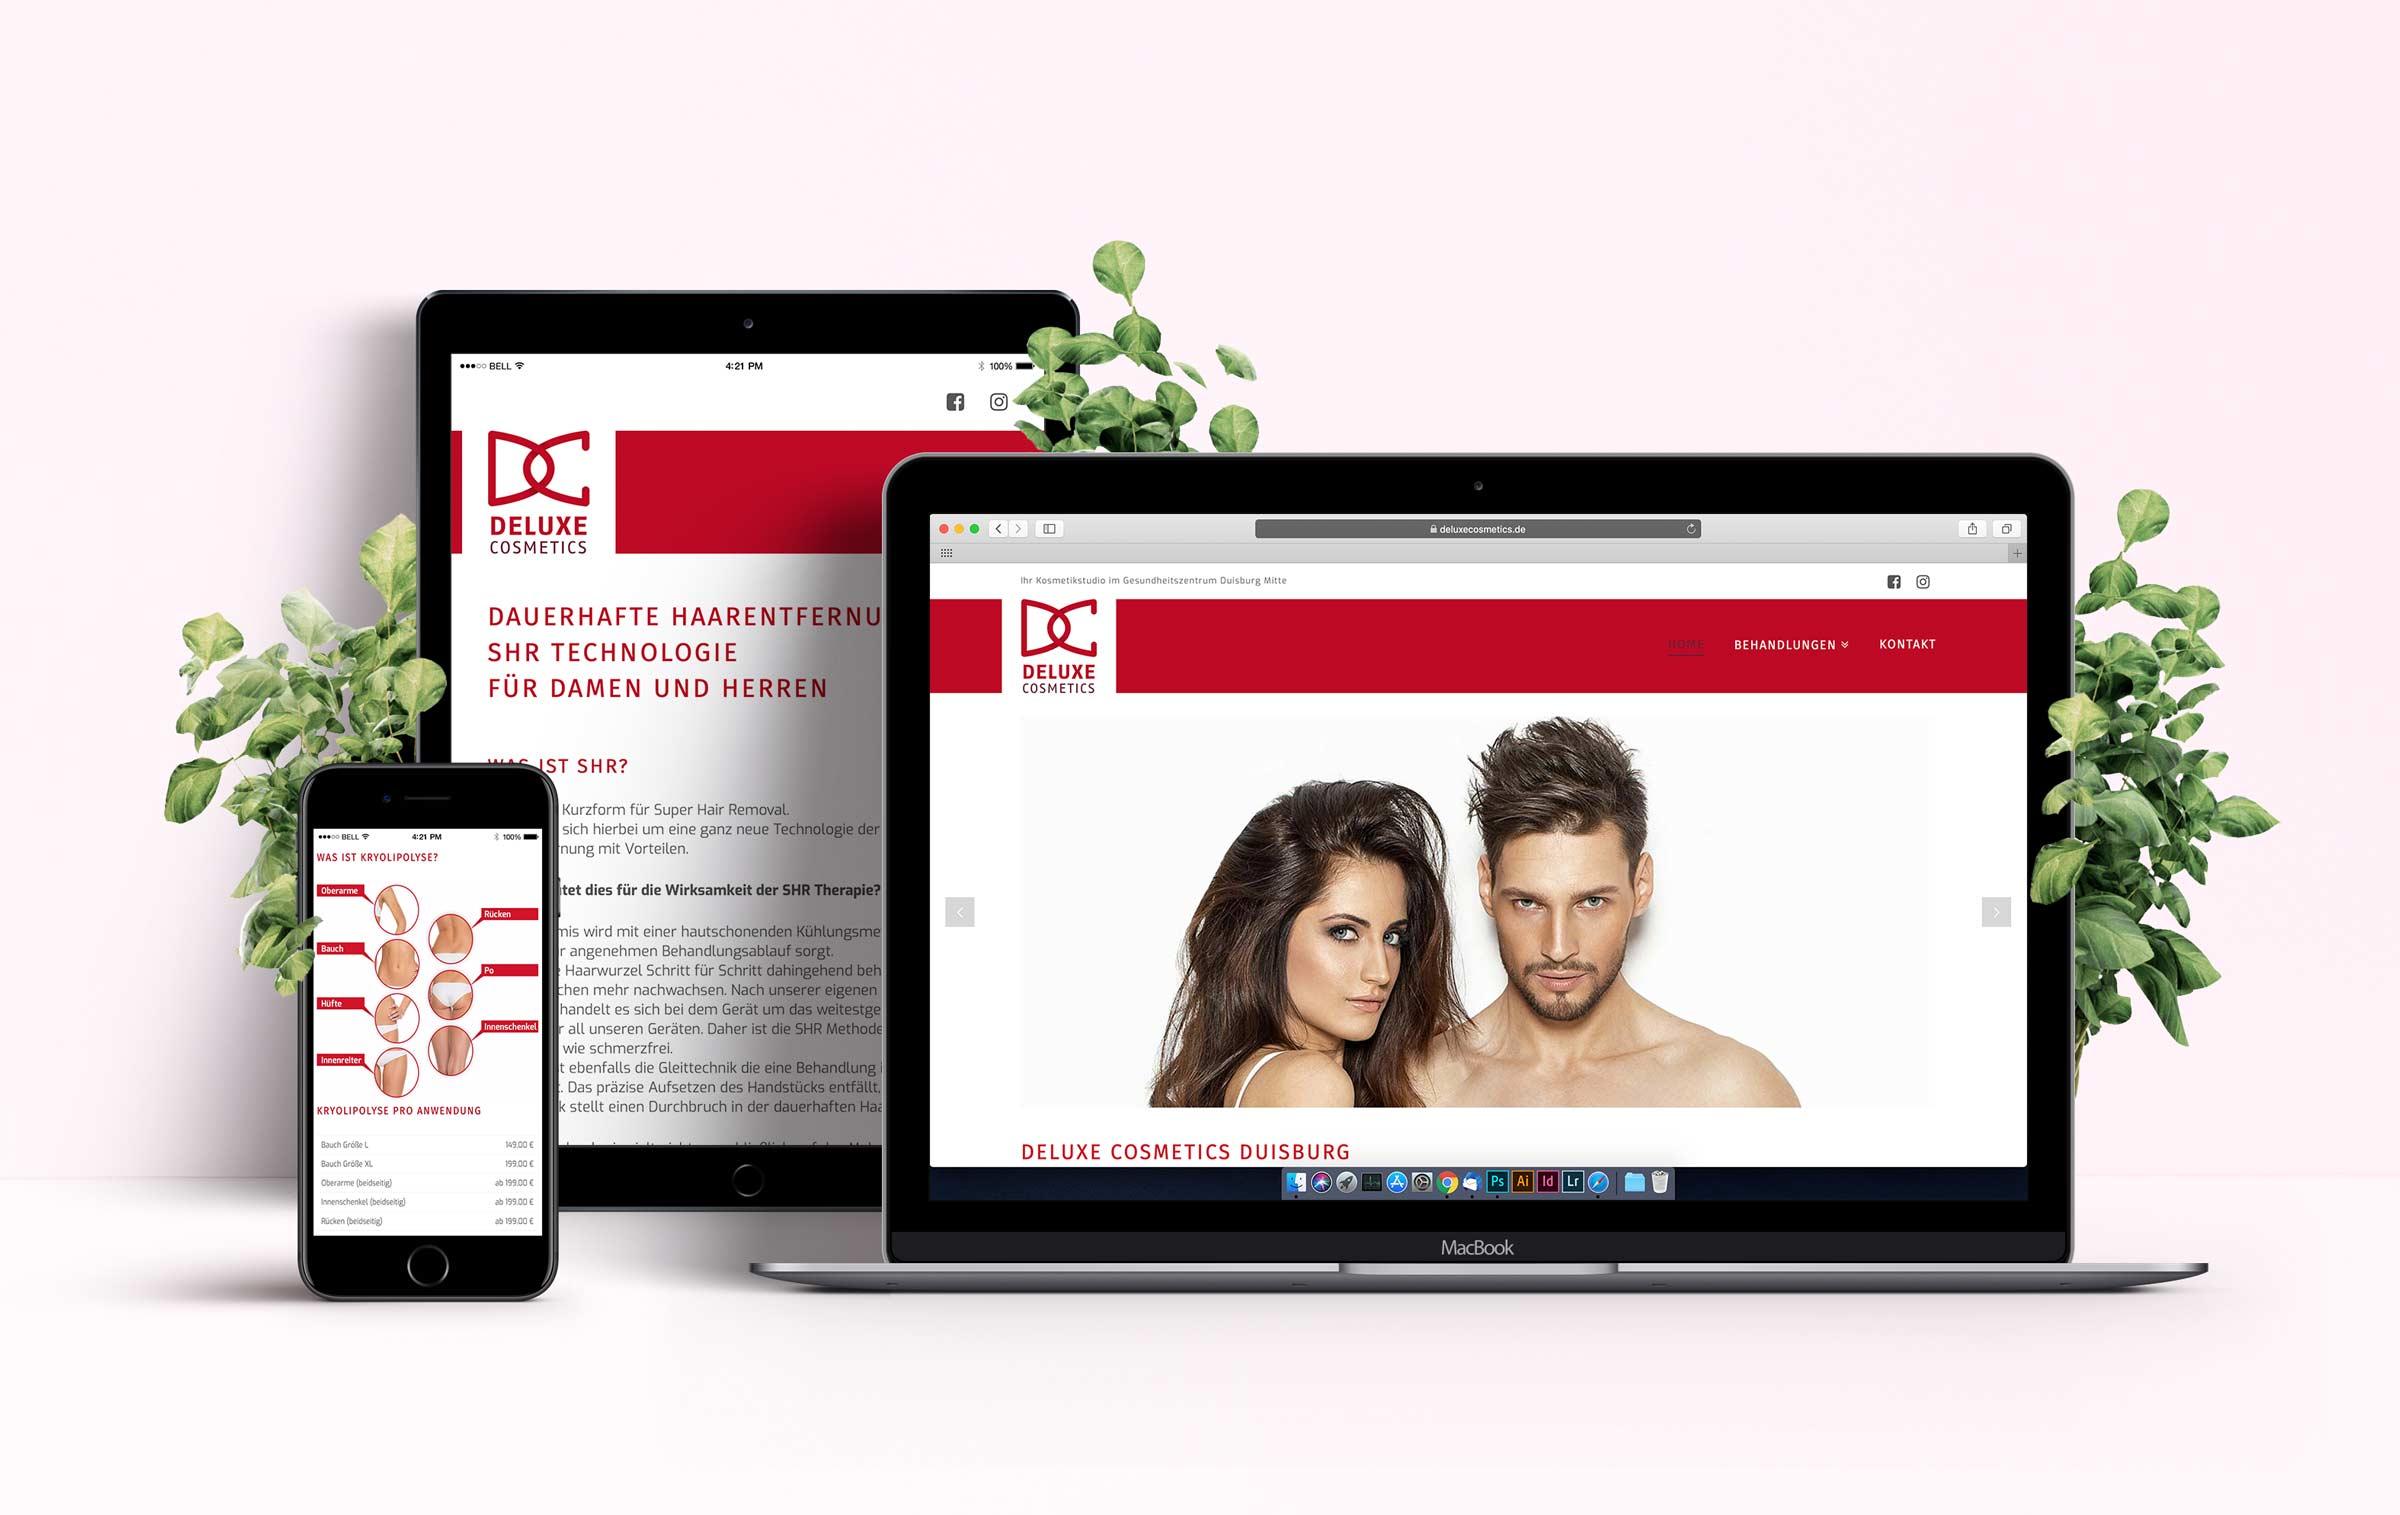 Deluxe Cosmetics Webdesign Vorschau